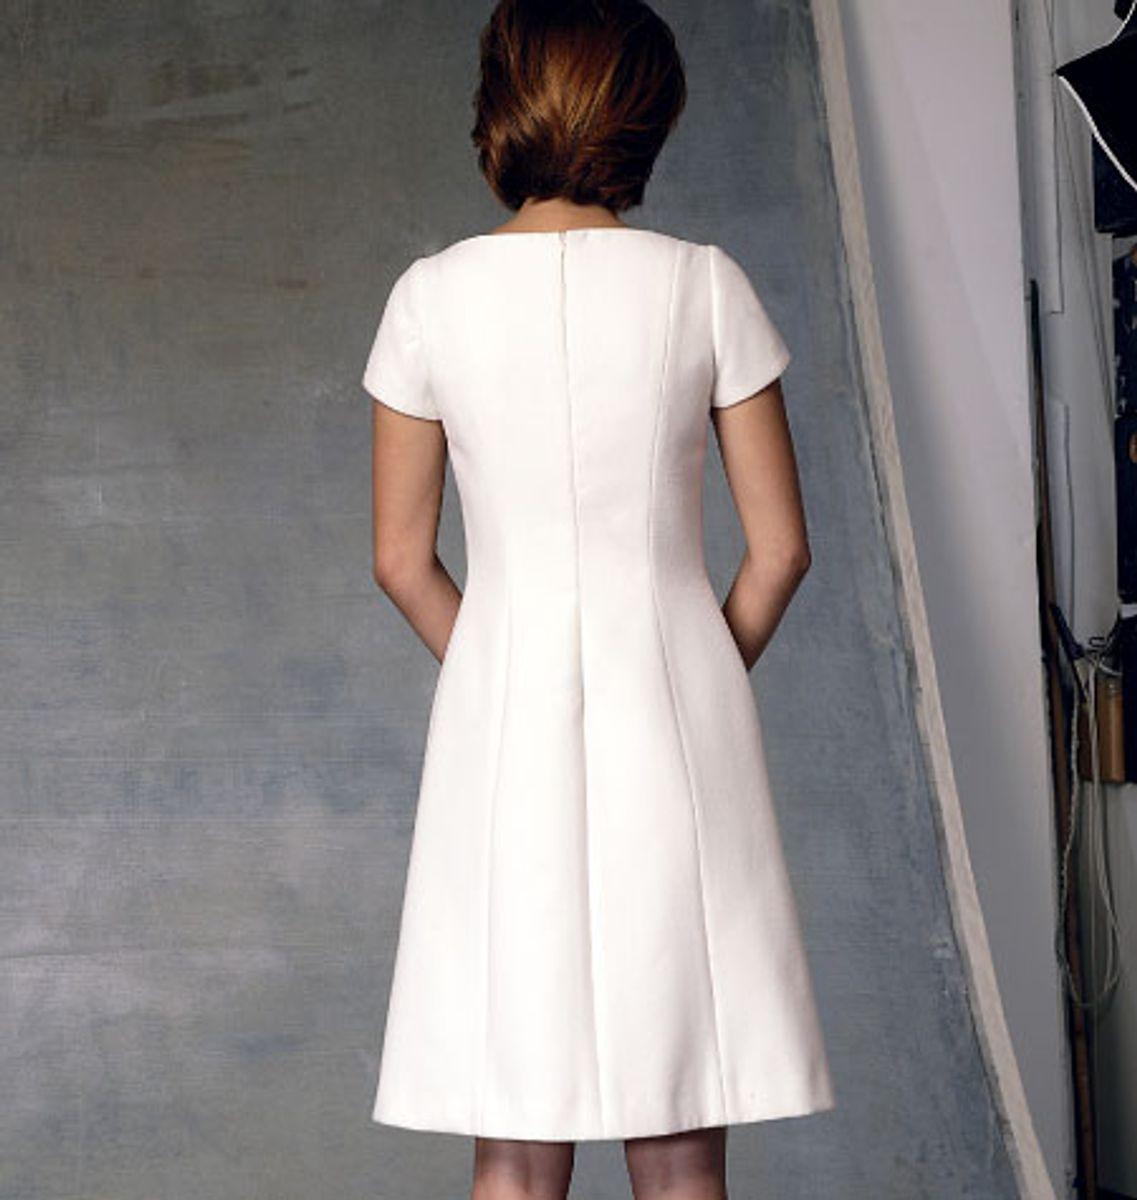 Patron de robe - Vogue 1423